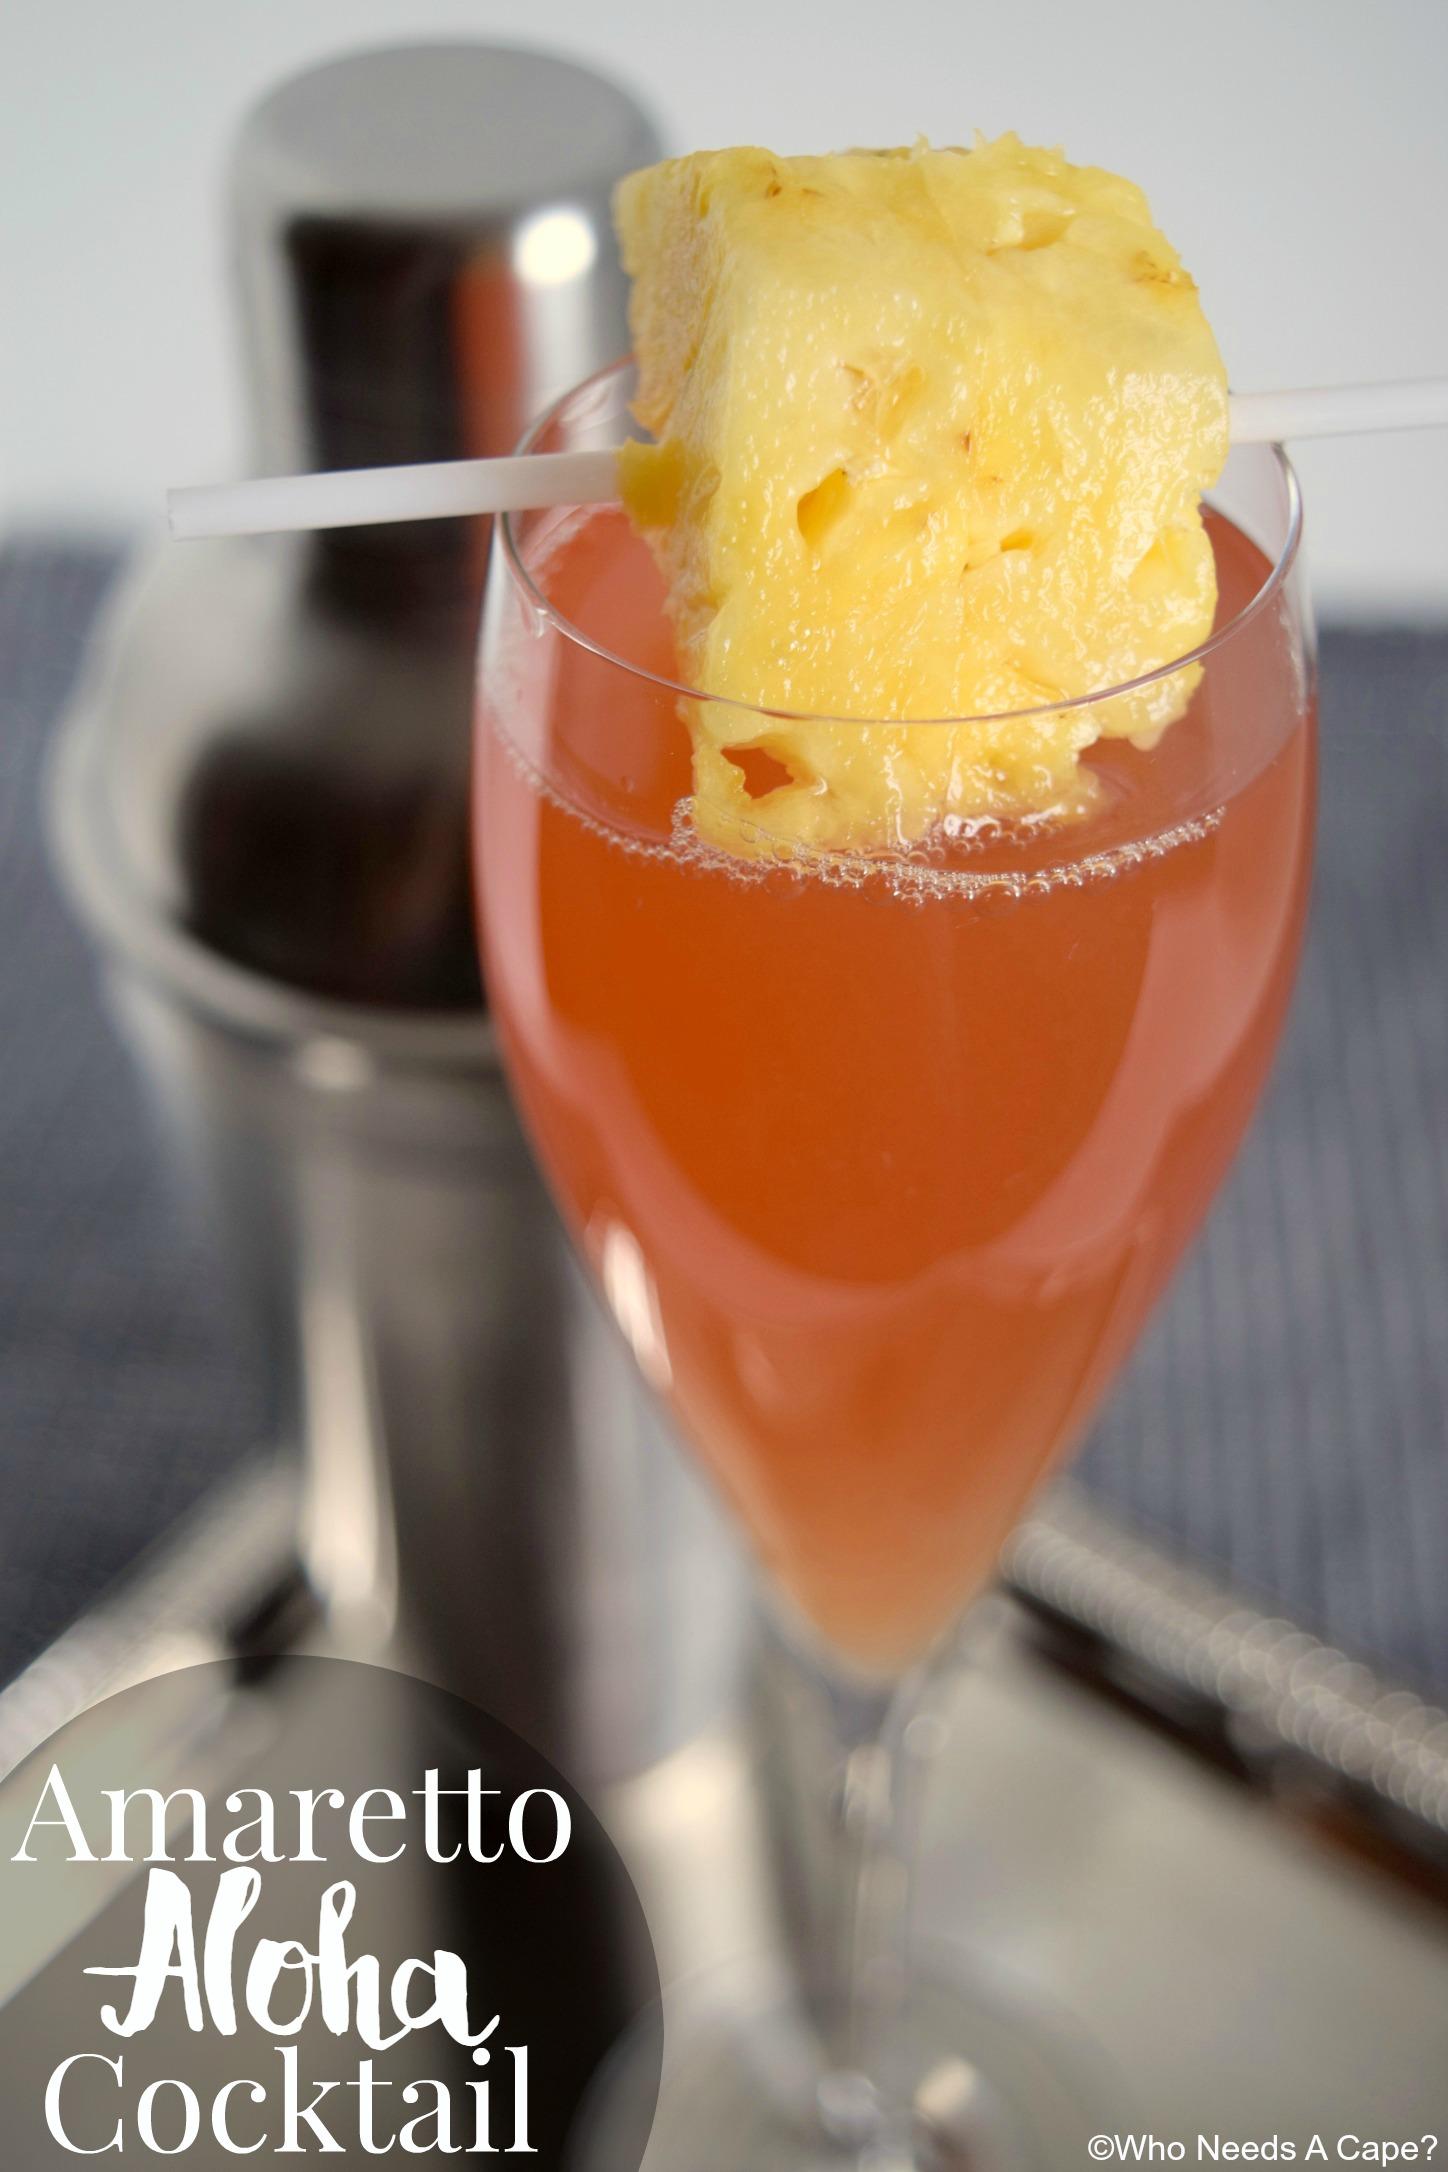 Amaretto Aloha Cocktail